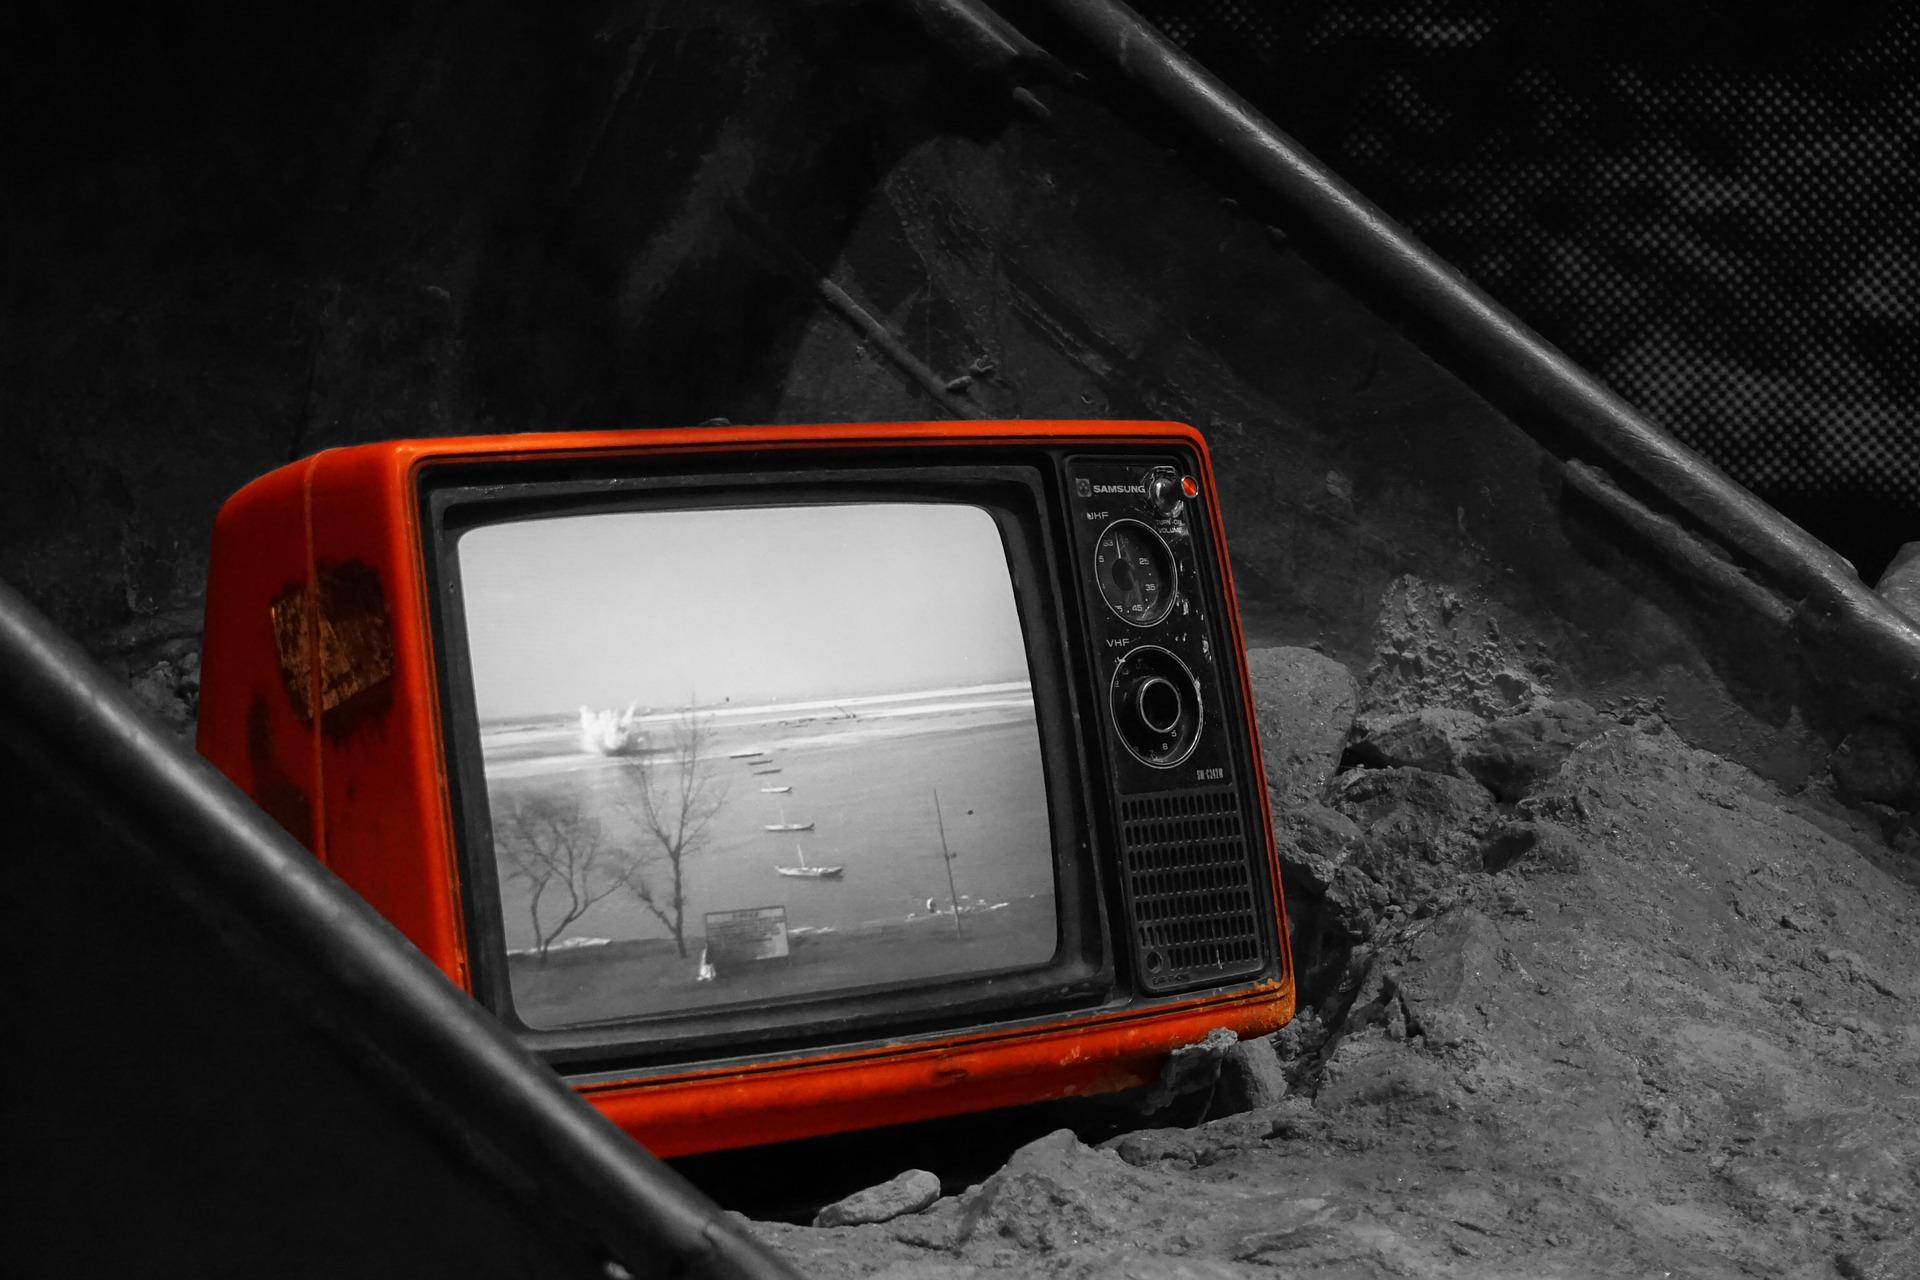 television-899265_1920.jpg